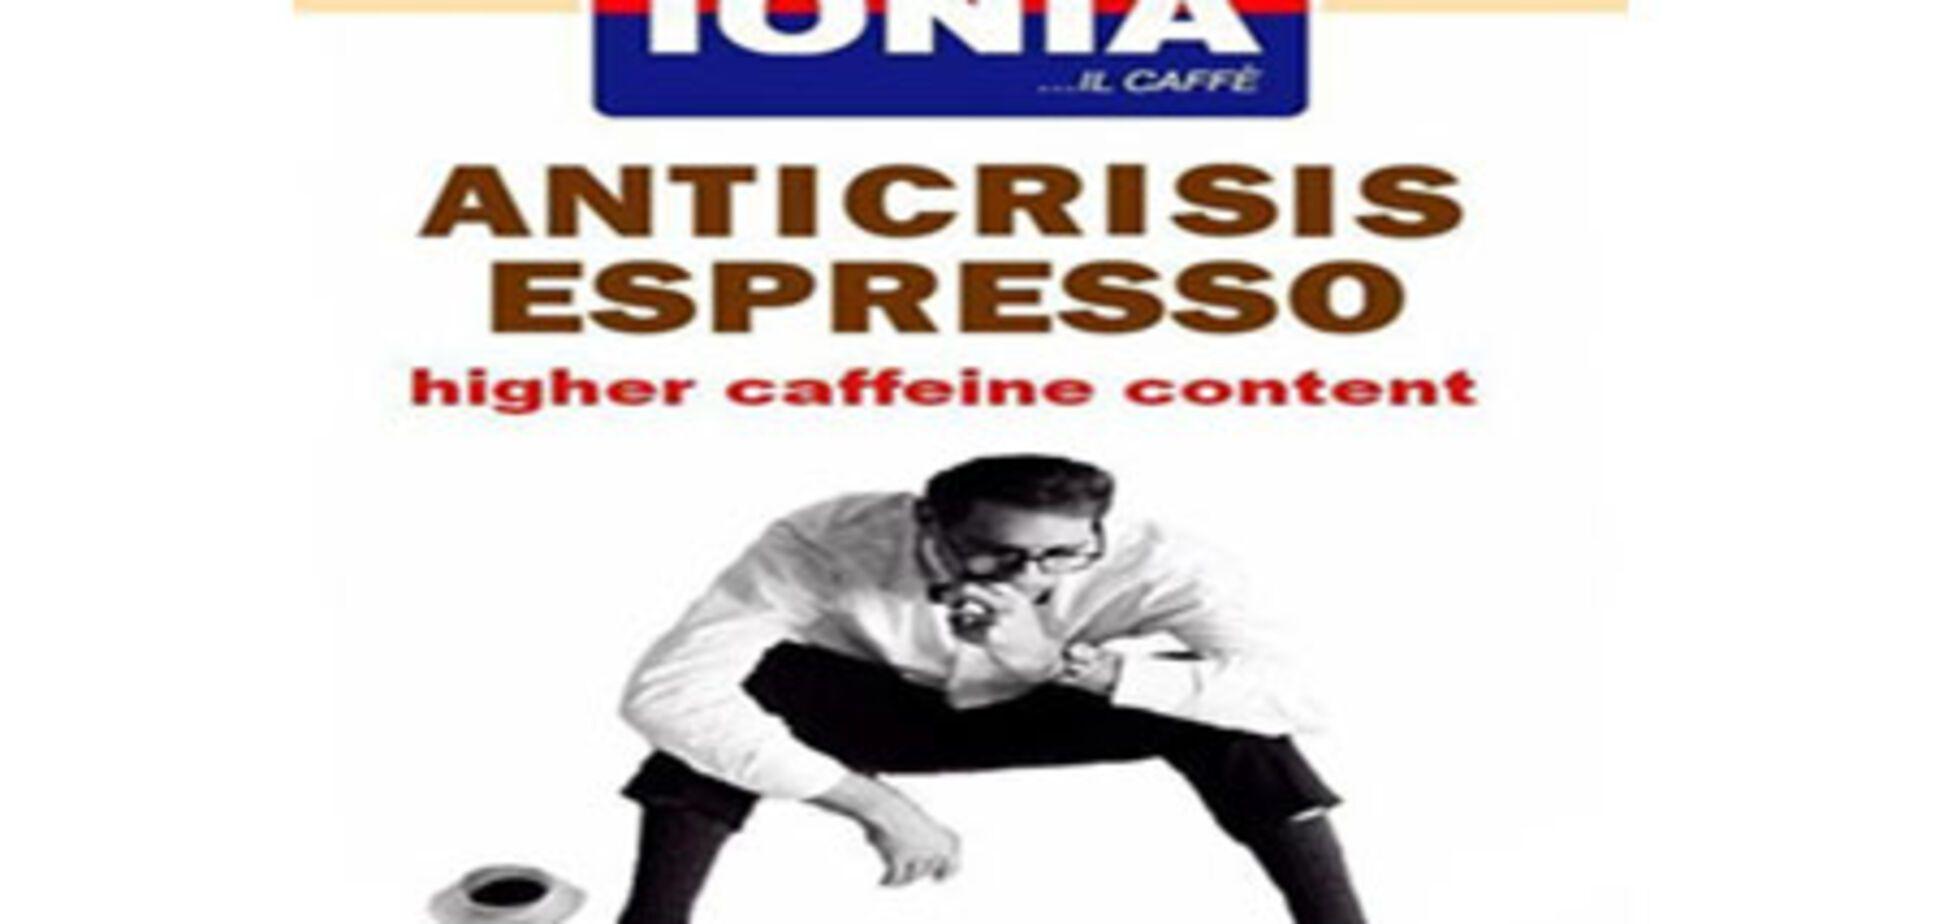 Кризис и кофе